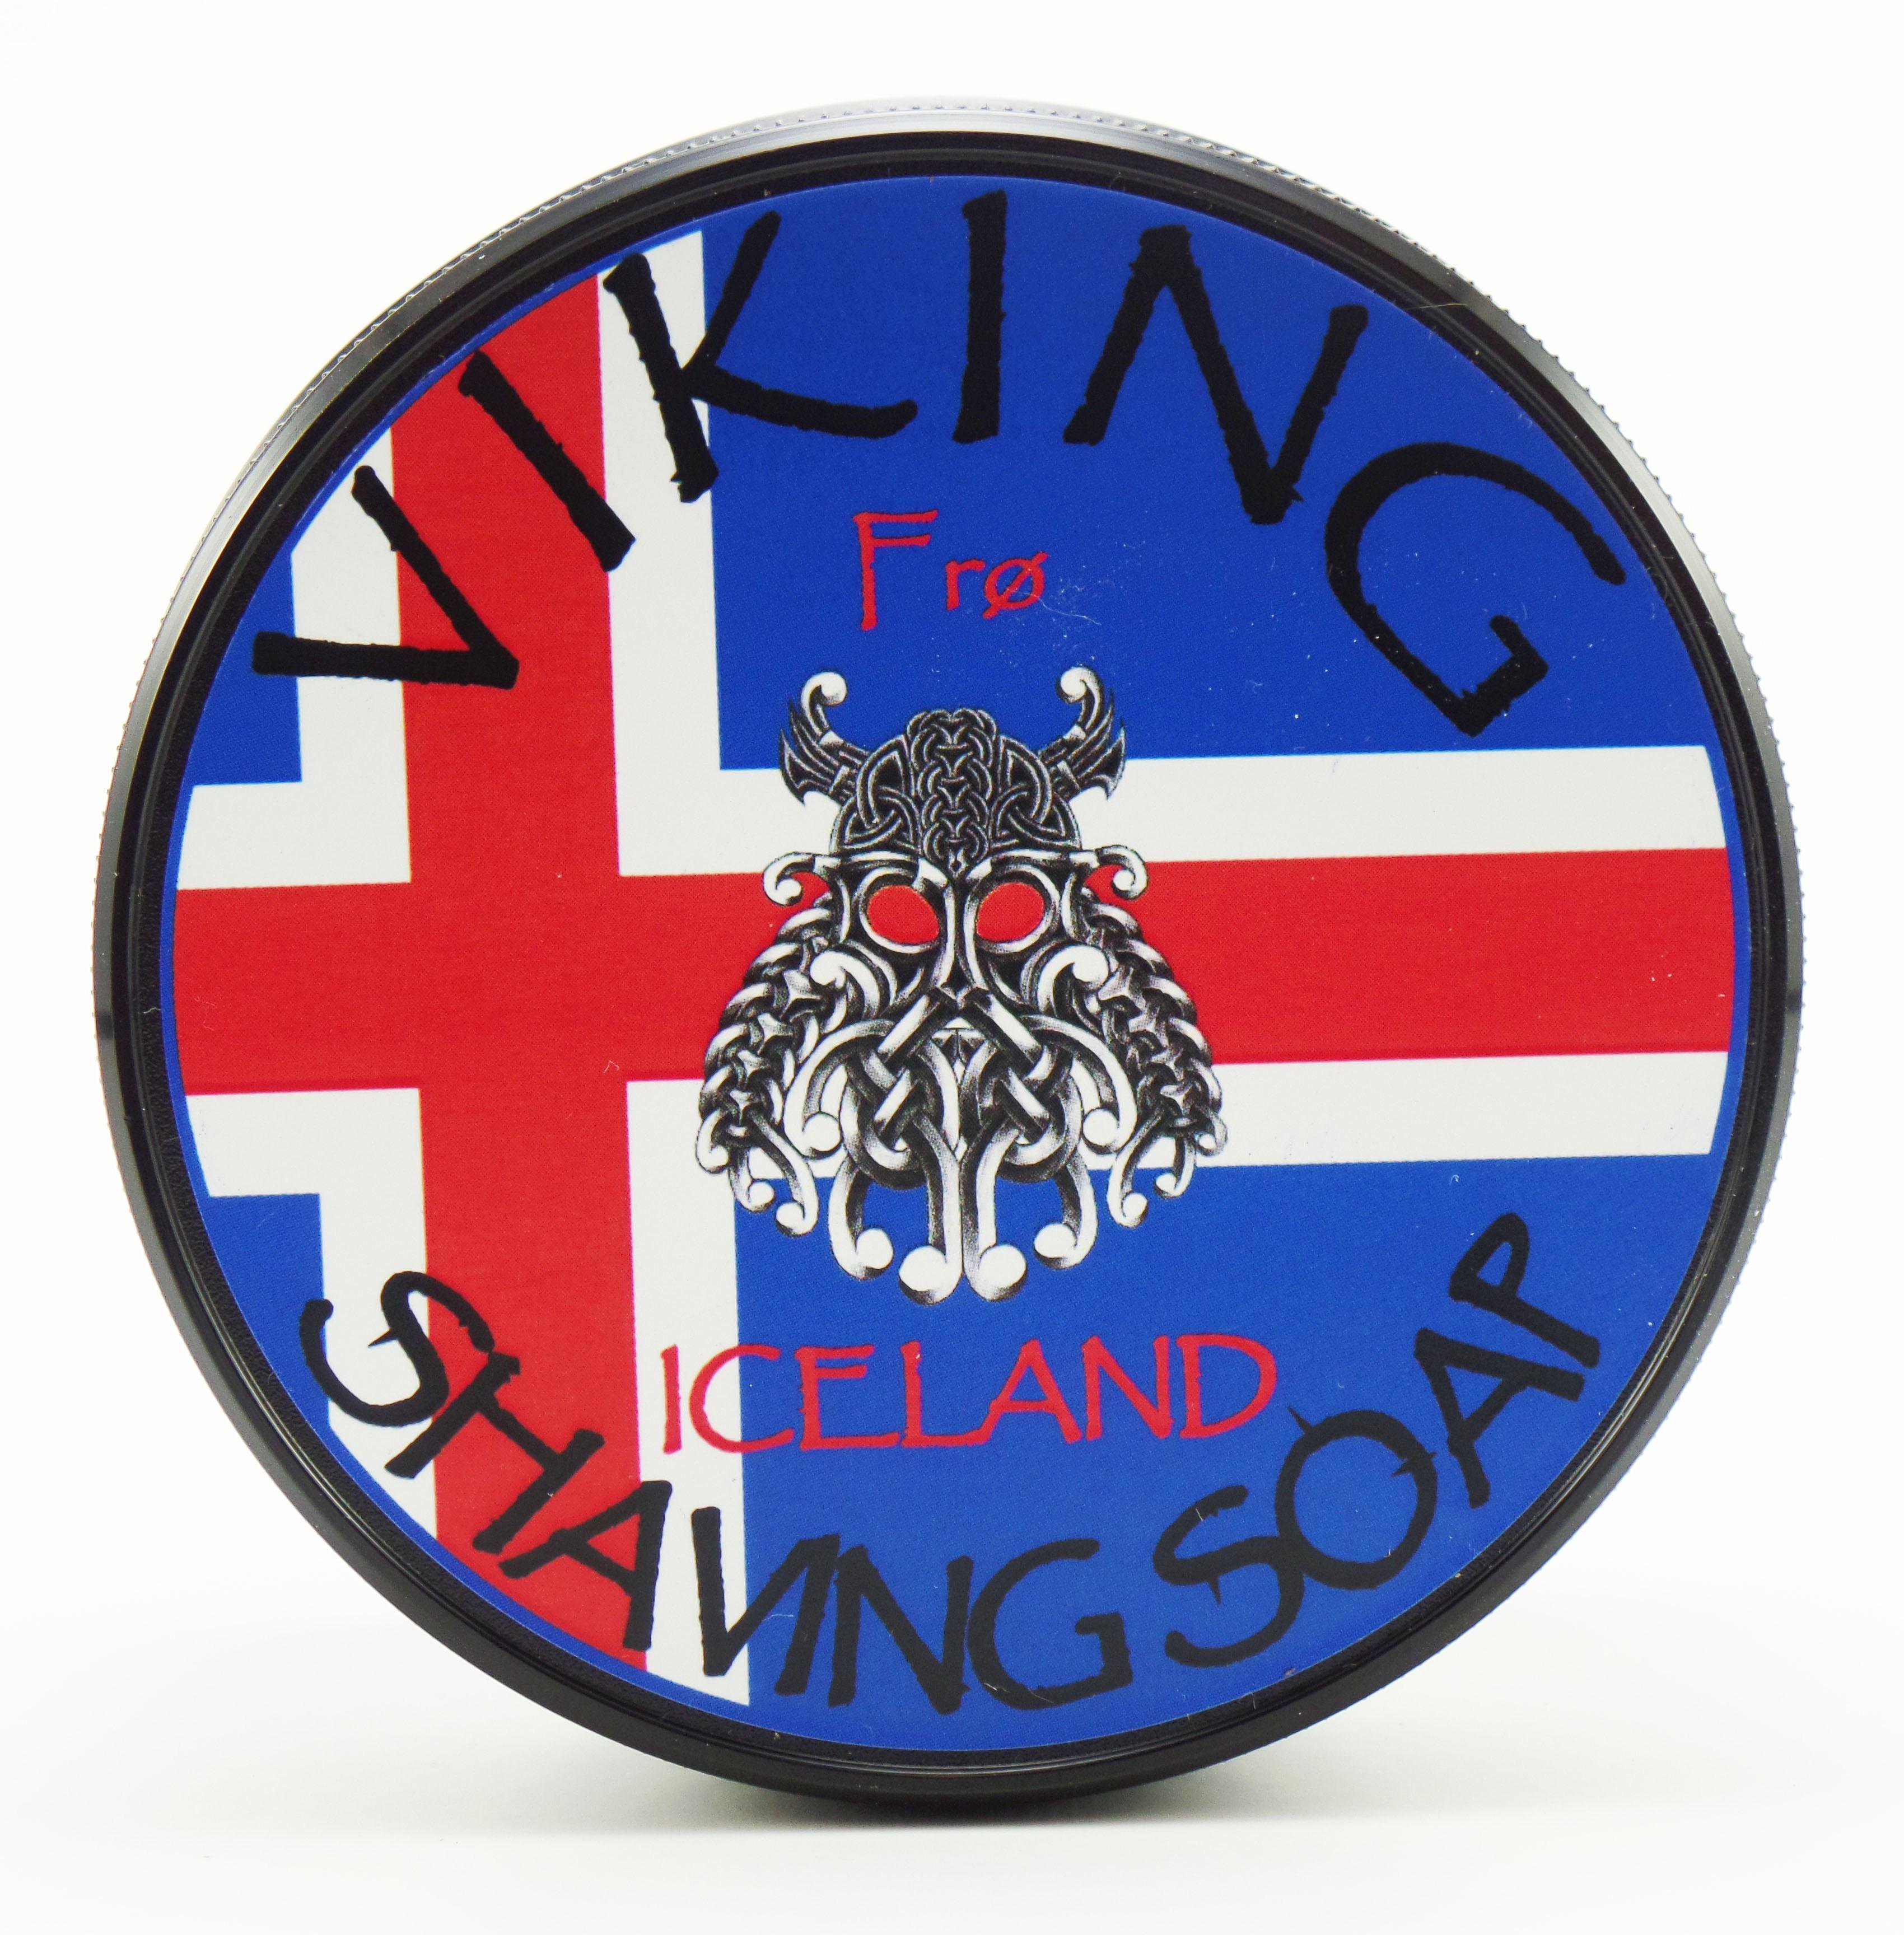 Viking Shaving Soap - Iceland - Soap (Vegan) image